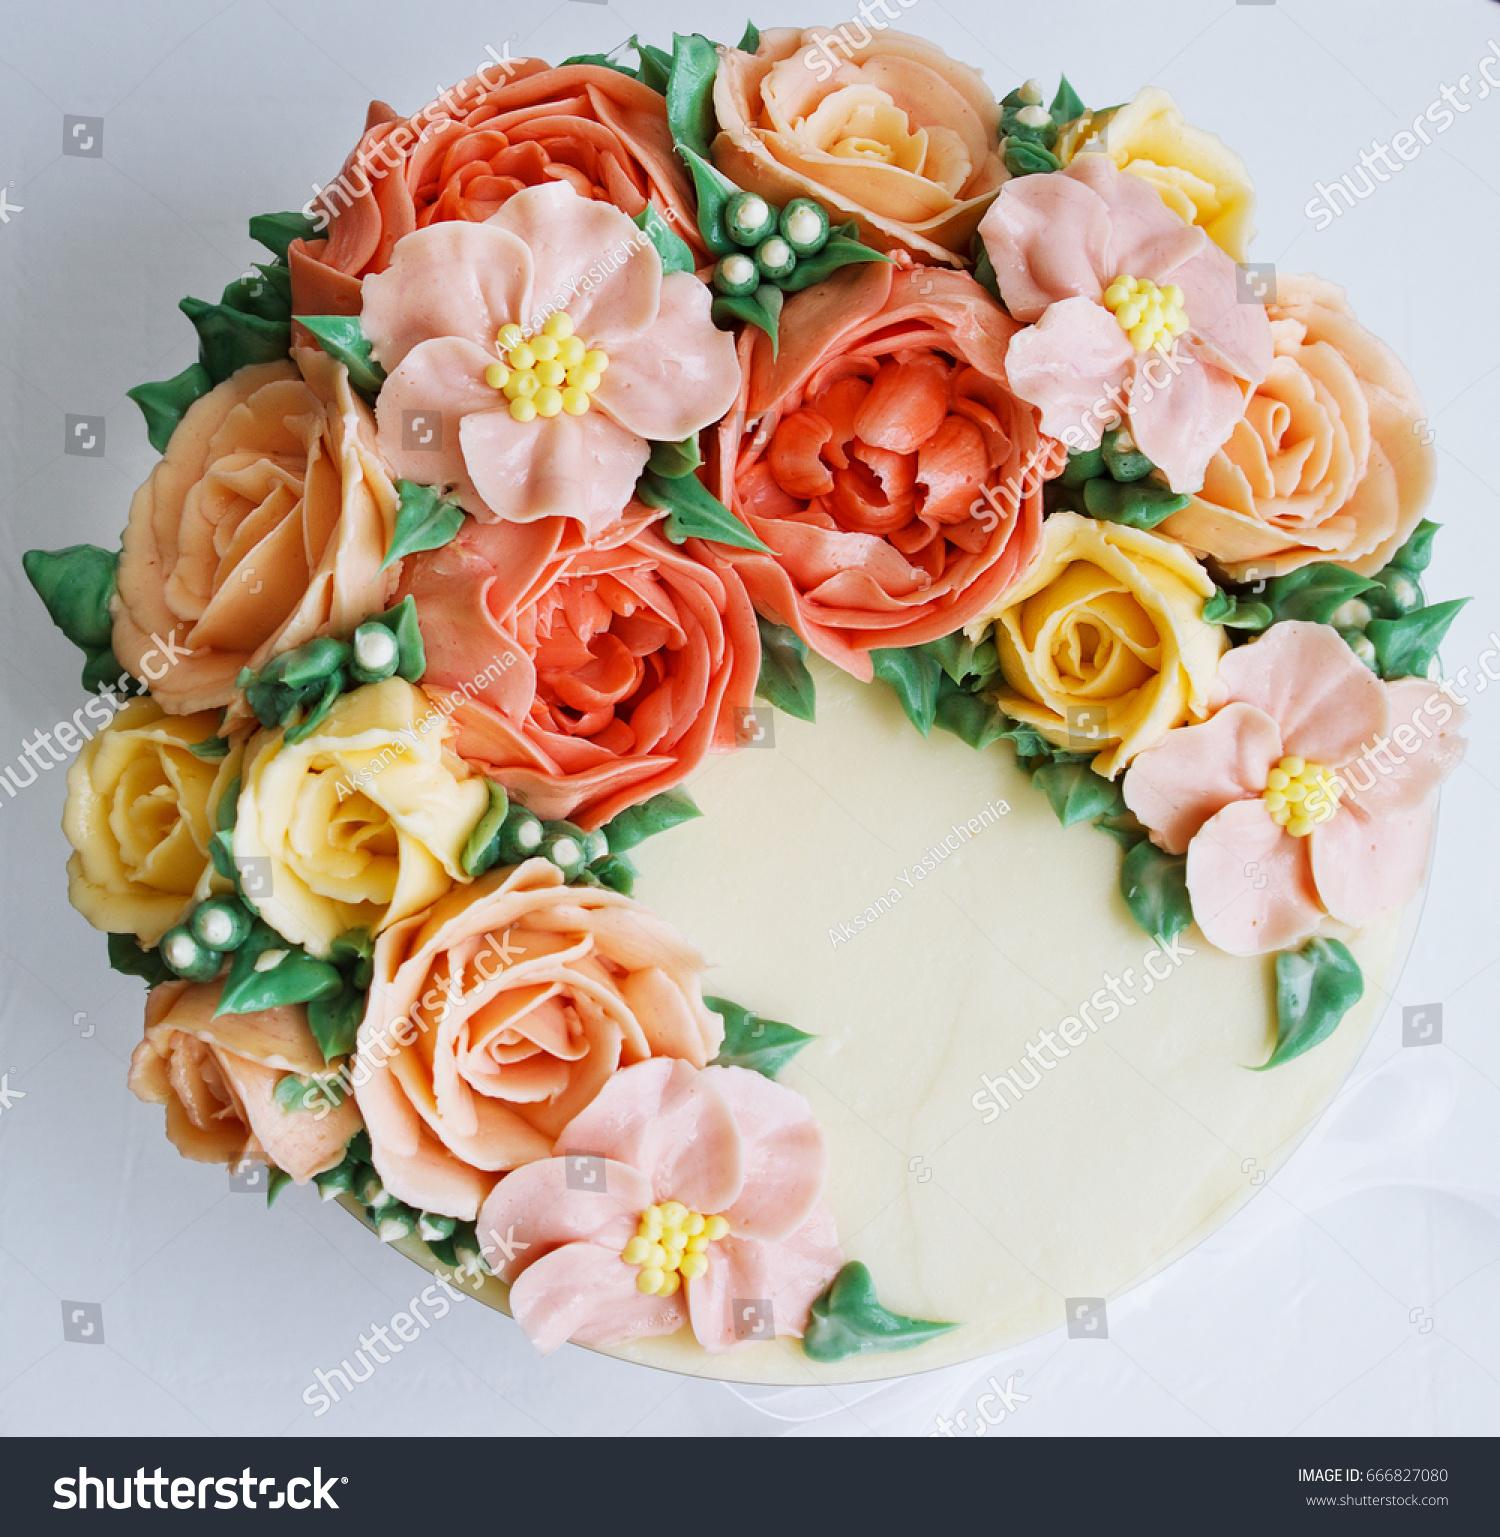 Birthday cake flowers rose on white stock photo edit now 666827080 birthday cake with flowers rose on white background izmirmasajfo